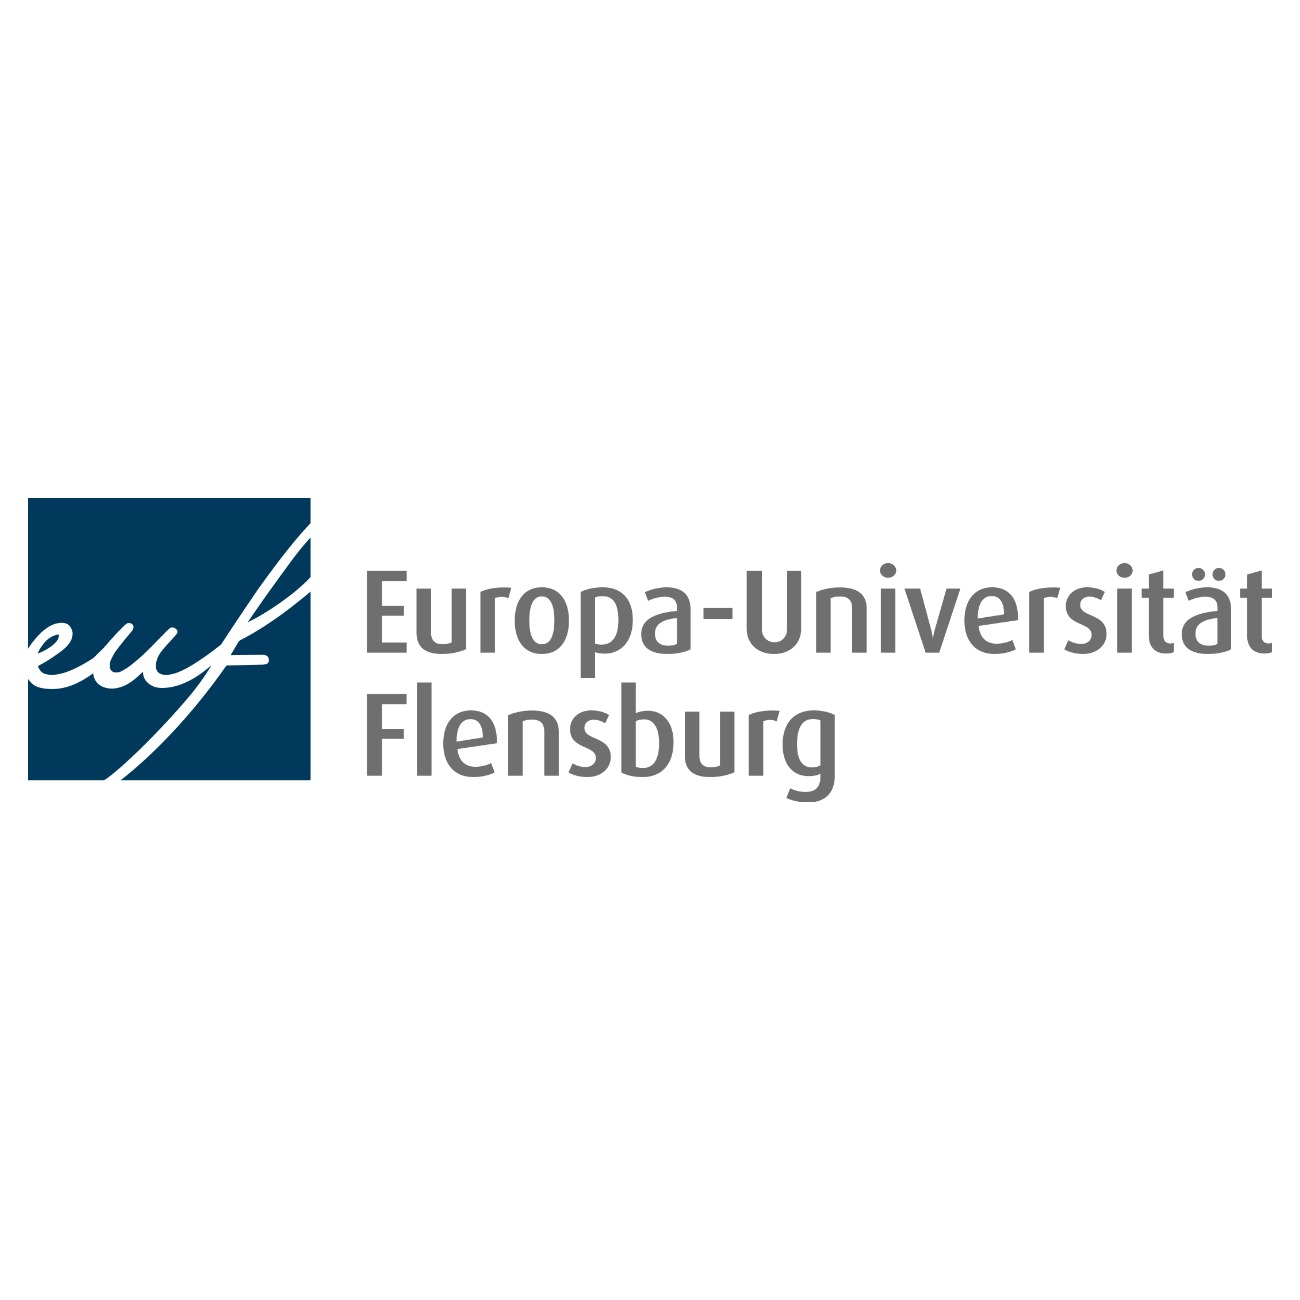 europa universitaet flensburg logo